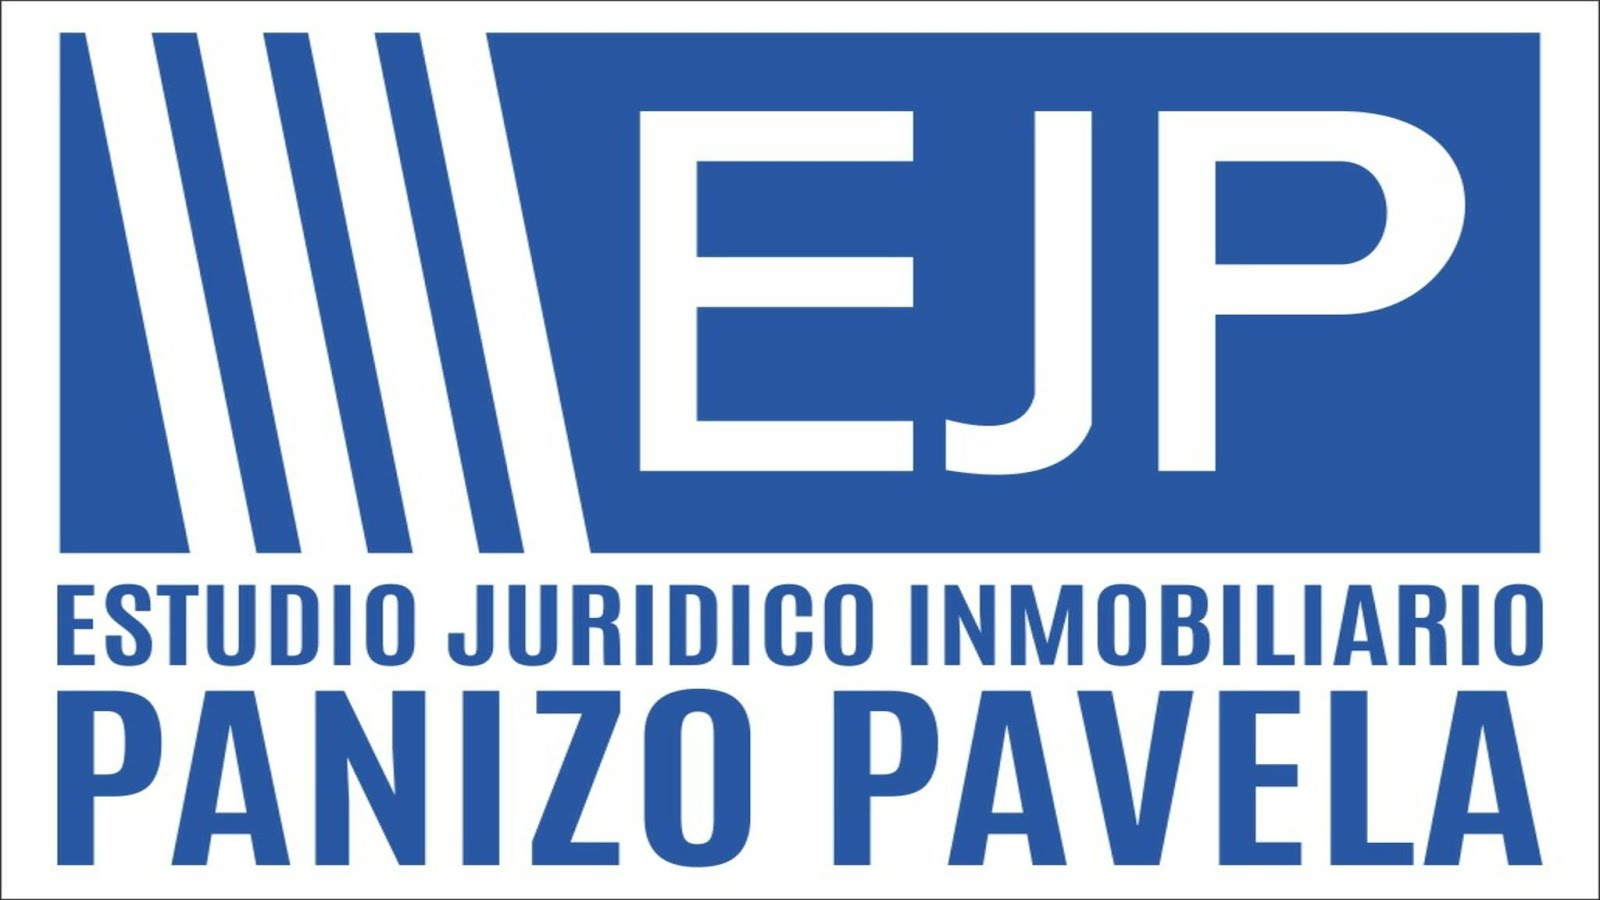 ABOGADOS en Mar del Plata :: EJP ESTUDIO JURIDICO Panizo Pavela :: Civil Comercial Familia Laboral